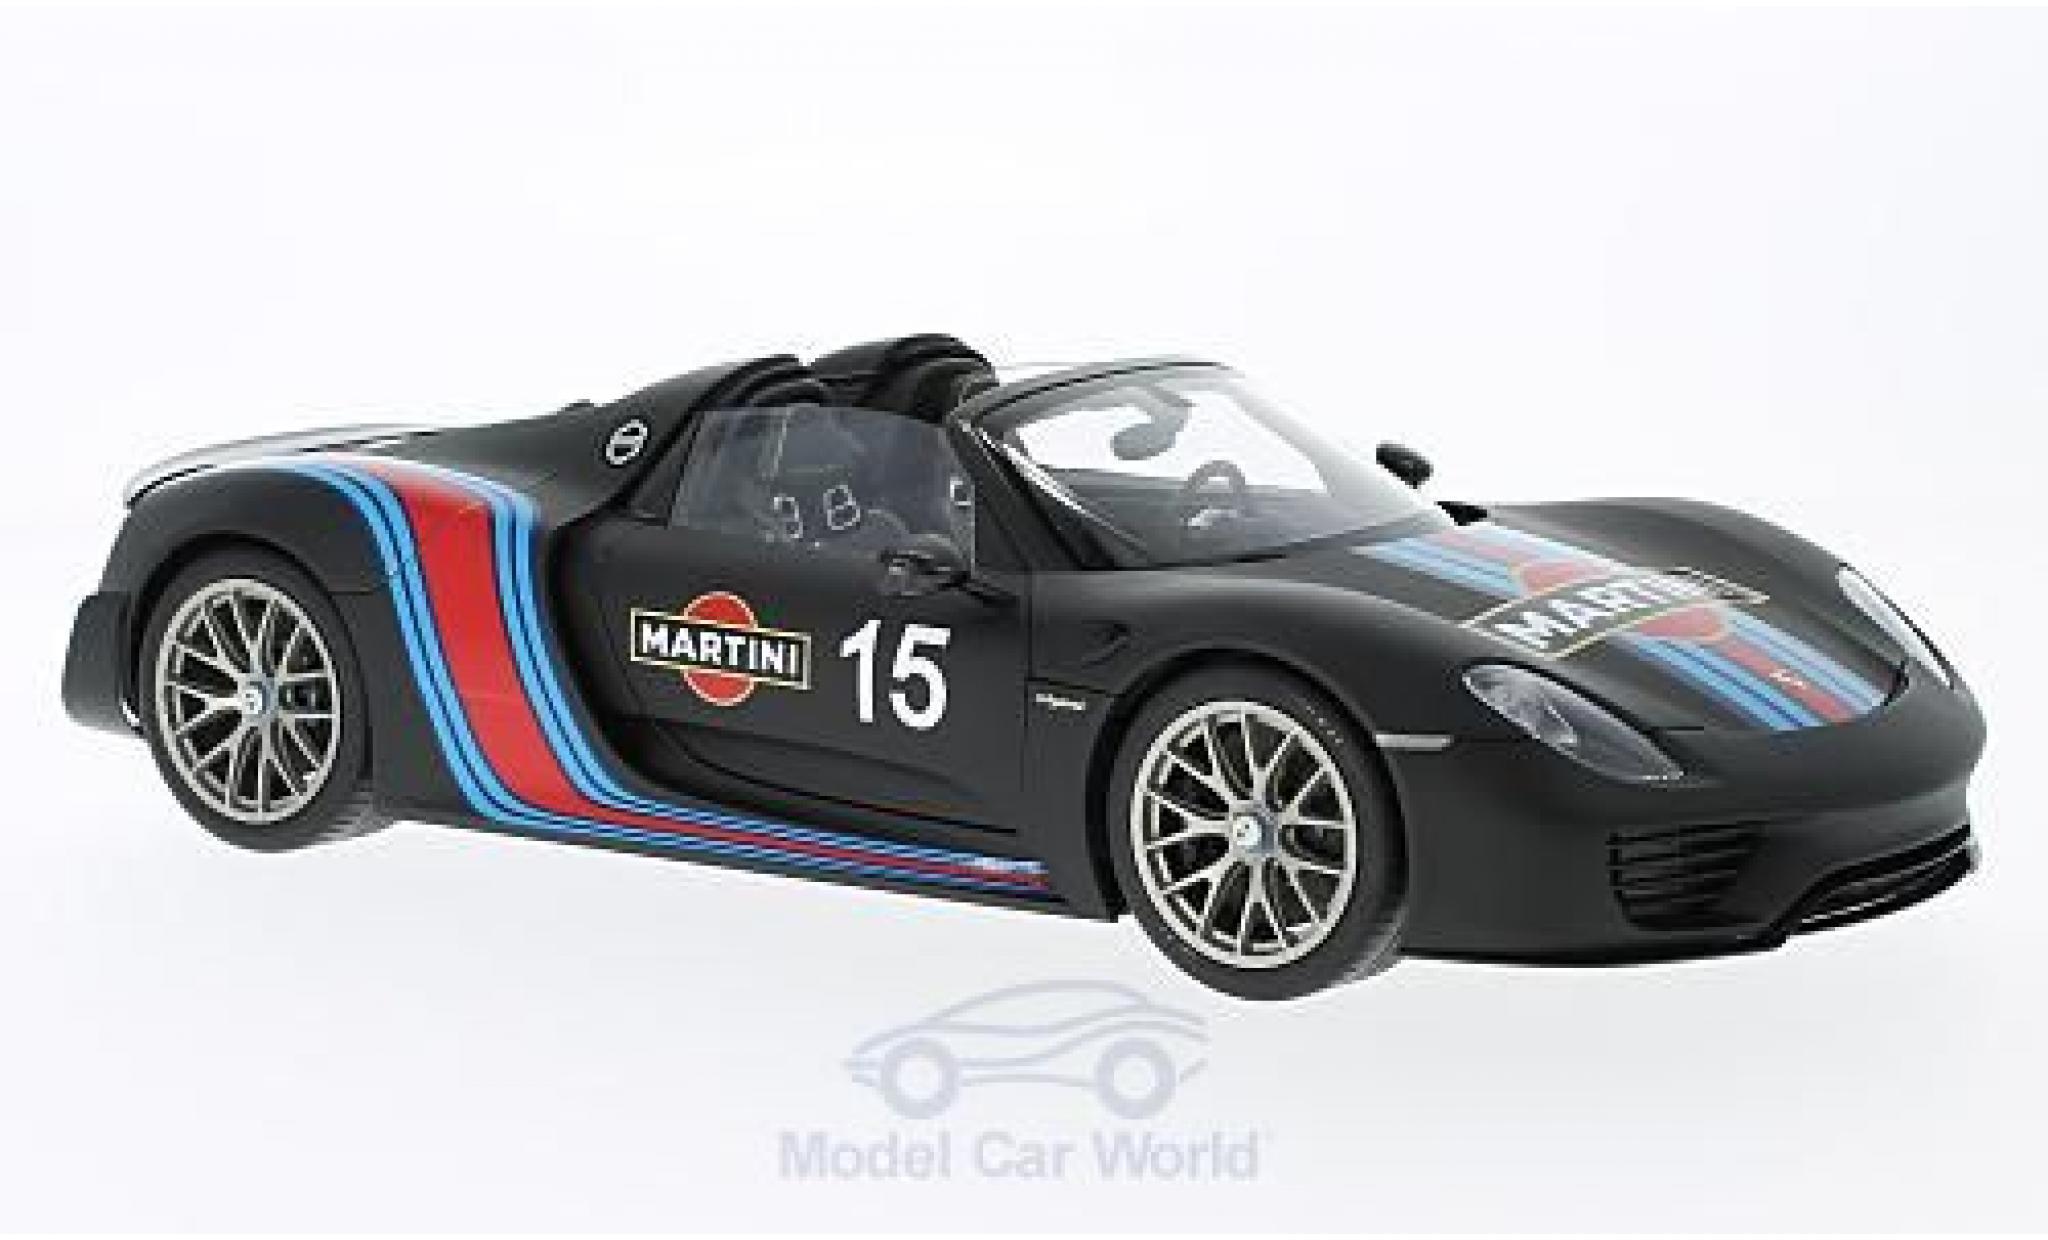 Porsche 918 2013 1/18 AUTOart Spyder black Martini 2013 Weissach Package